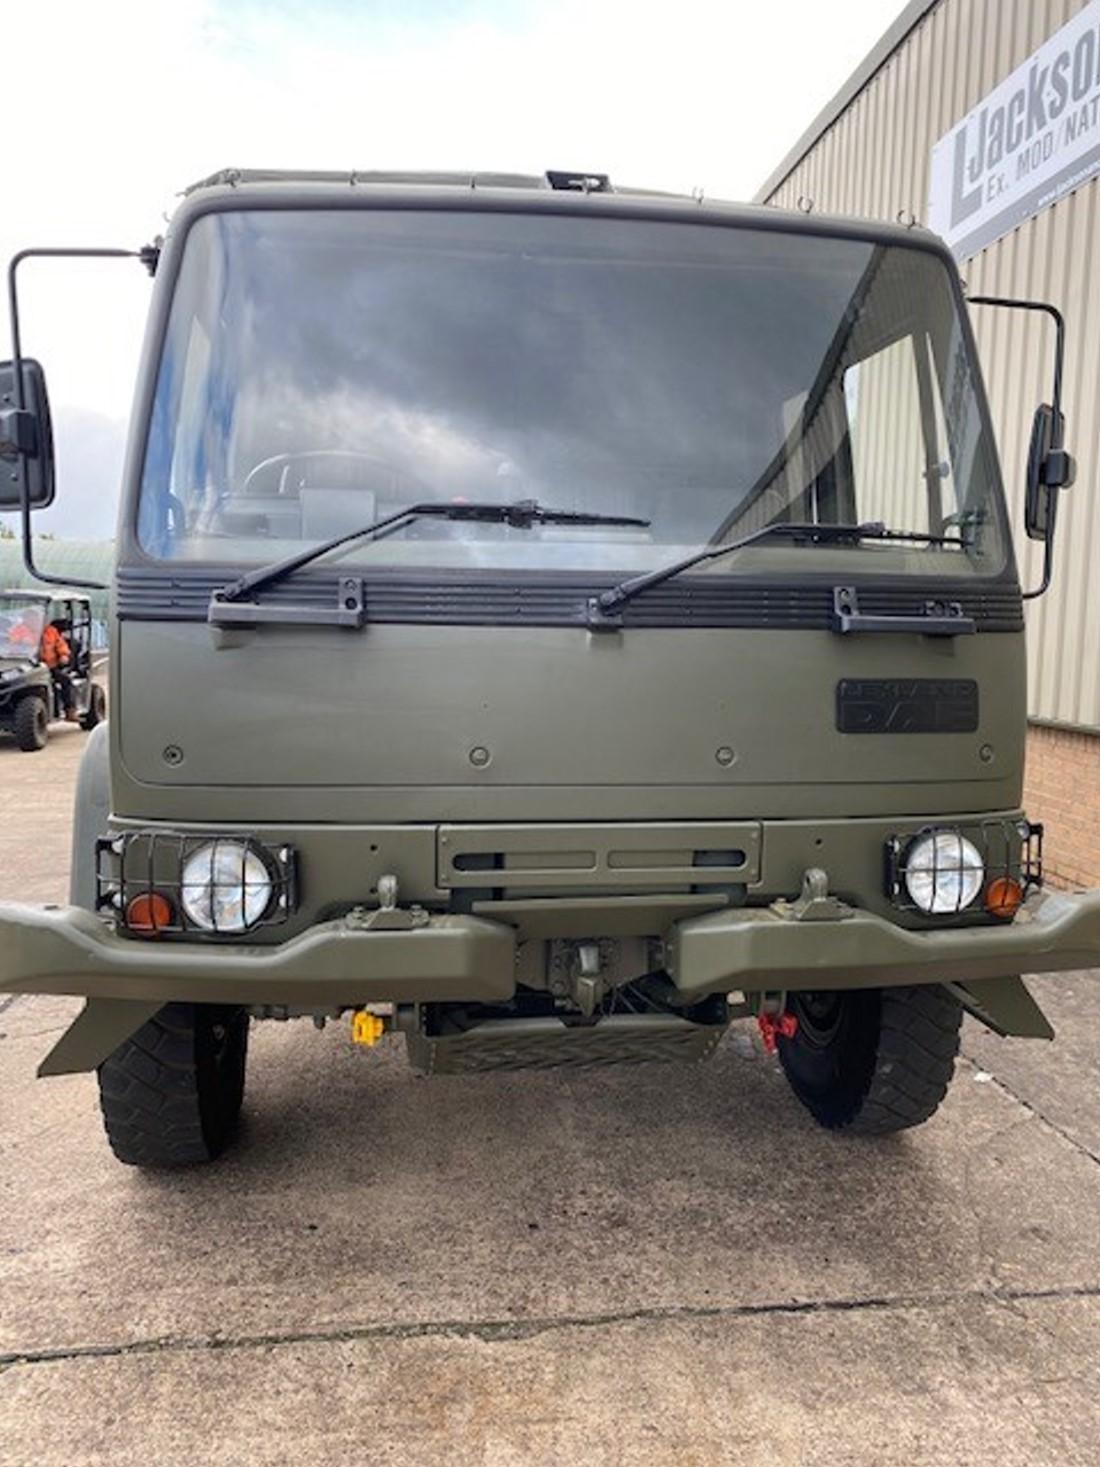 Leyland Daf 45.150 4x4 Shoot Vehicle Gun Bus for sale